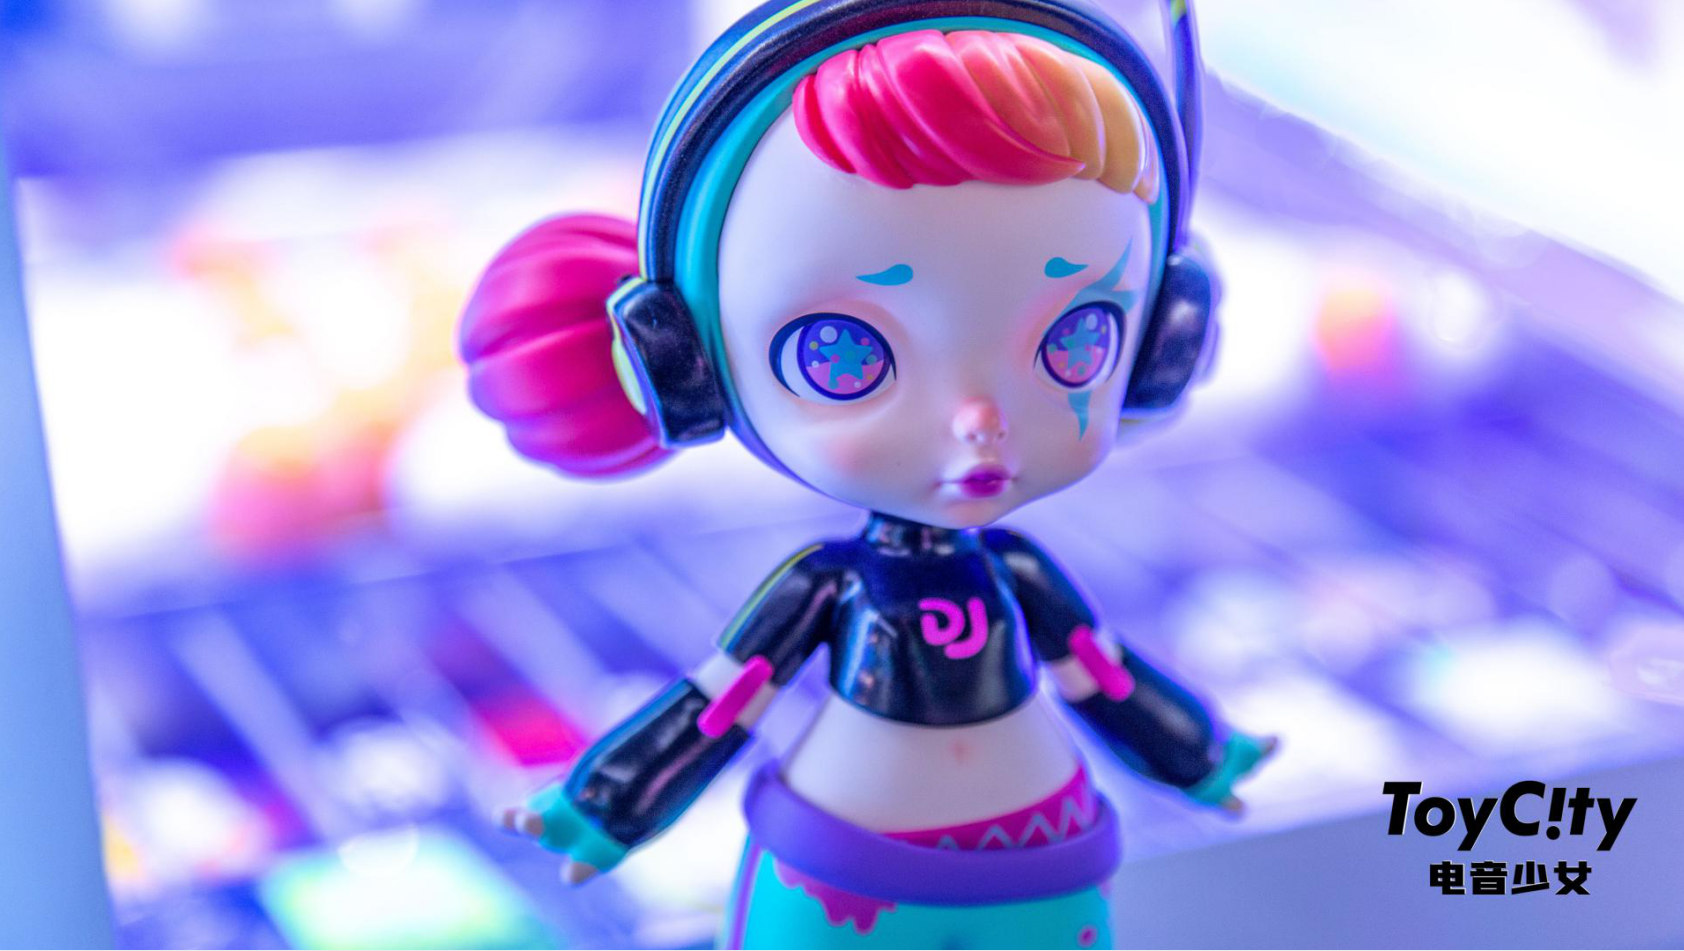 ToyCity玩具城市潮玩新品—电音少女Laura震撼上线